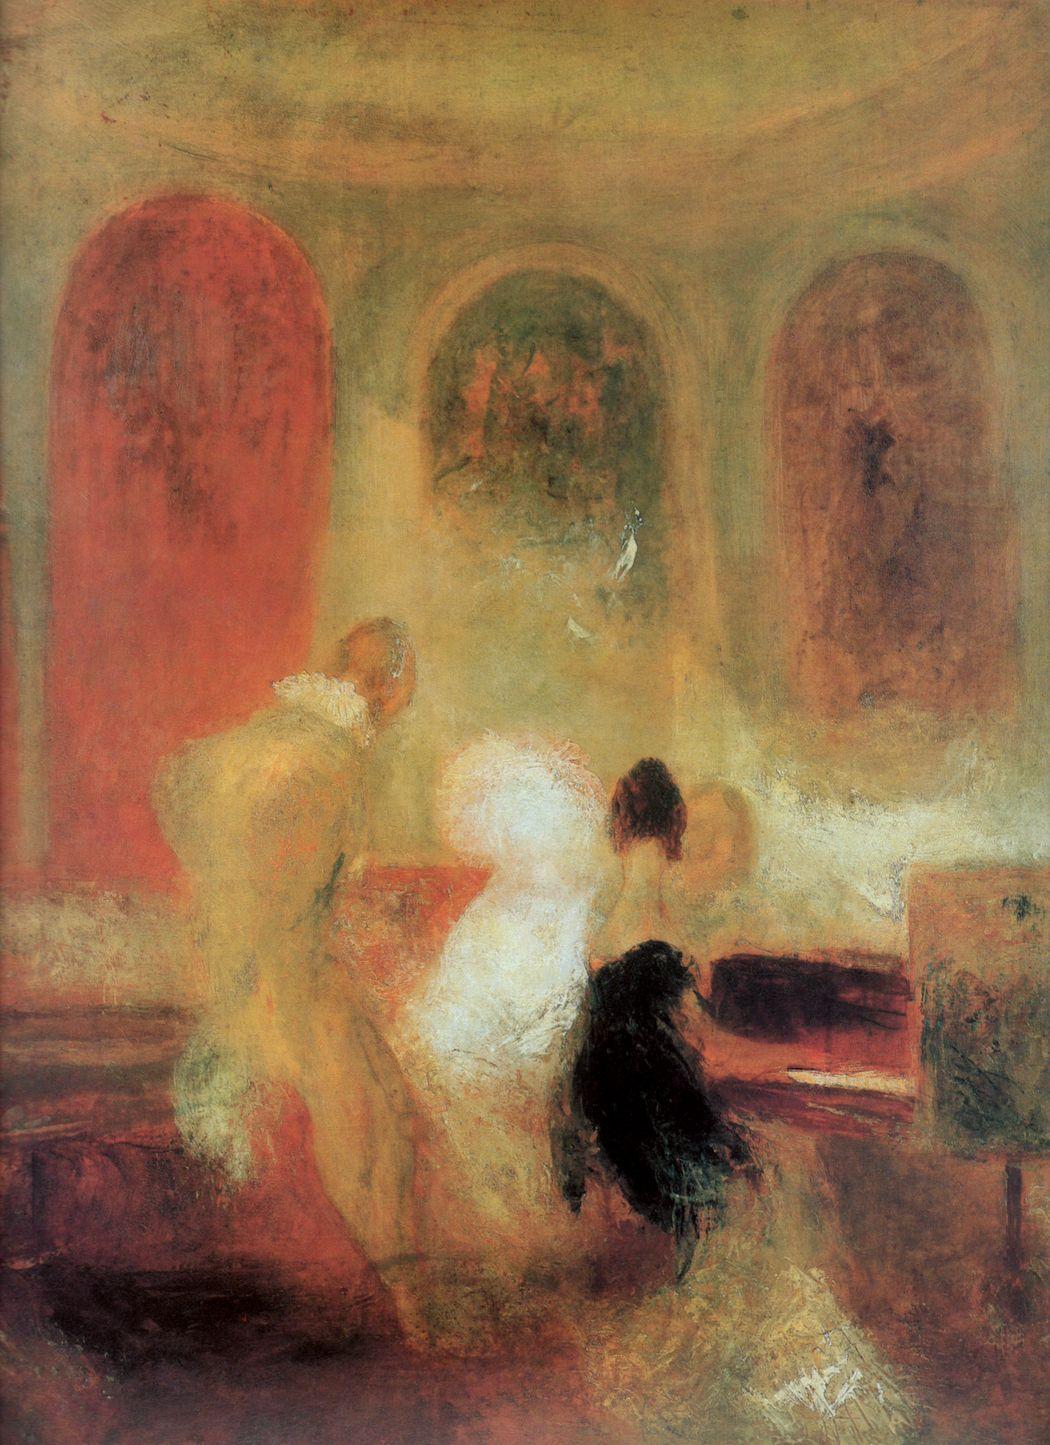 картина < Музицирующее общество в Петворте >:: Уильям Тёрнер ( William Turner ) - Тёрнер Уйльям фото